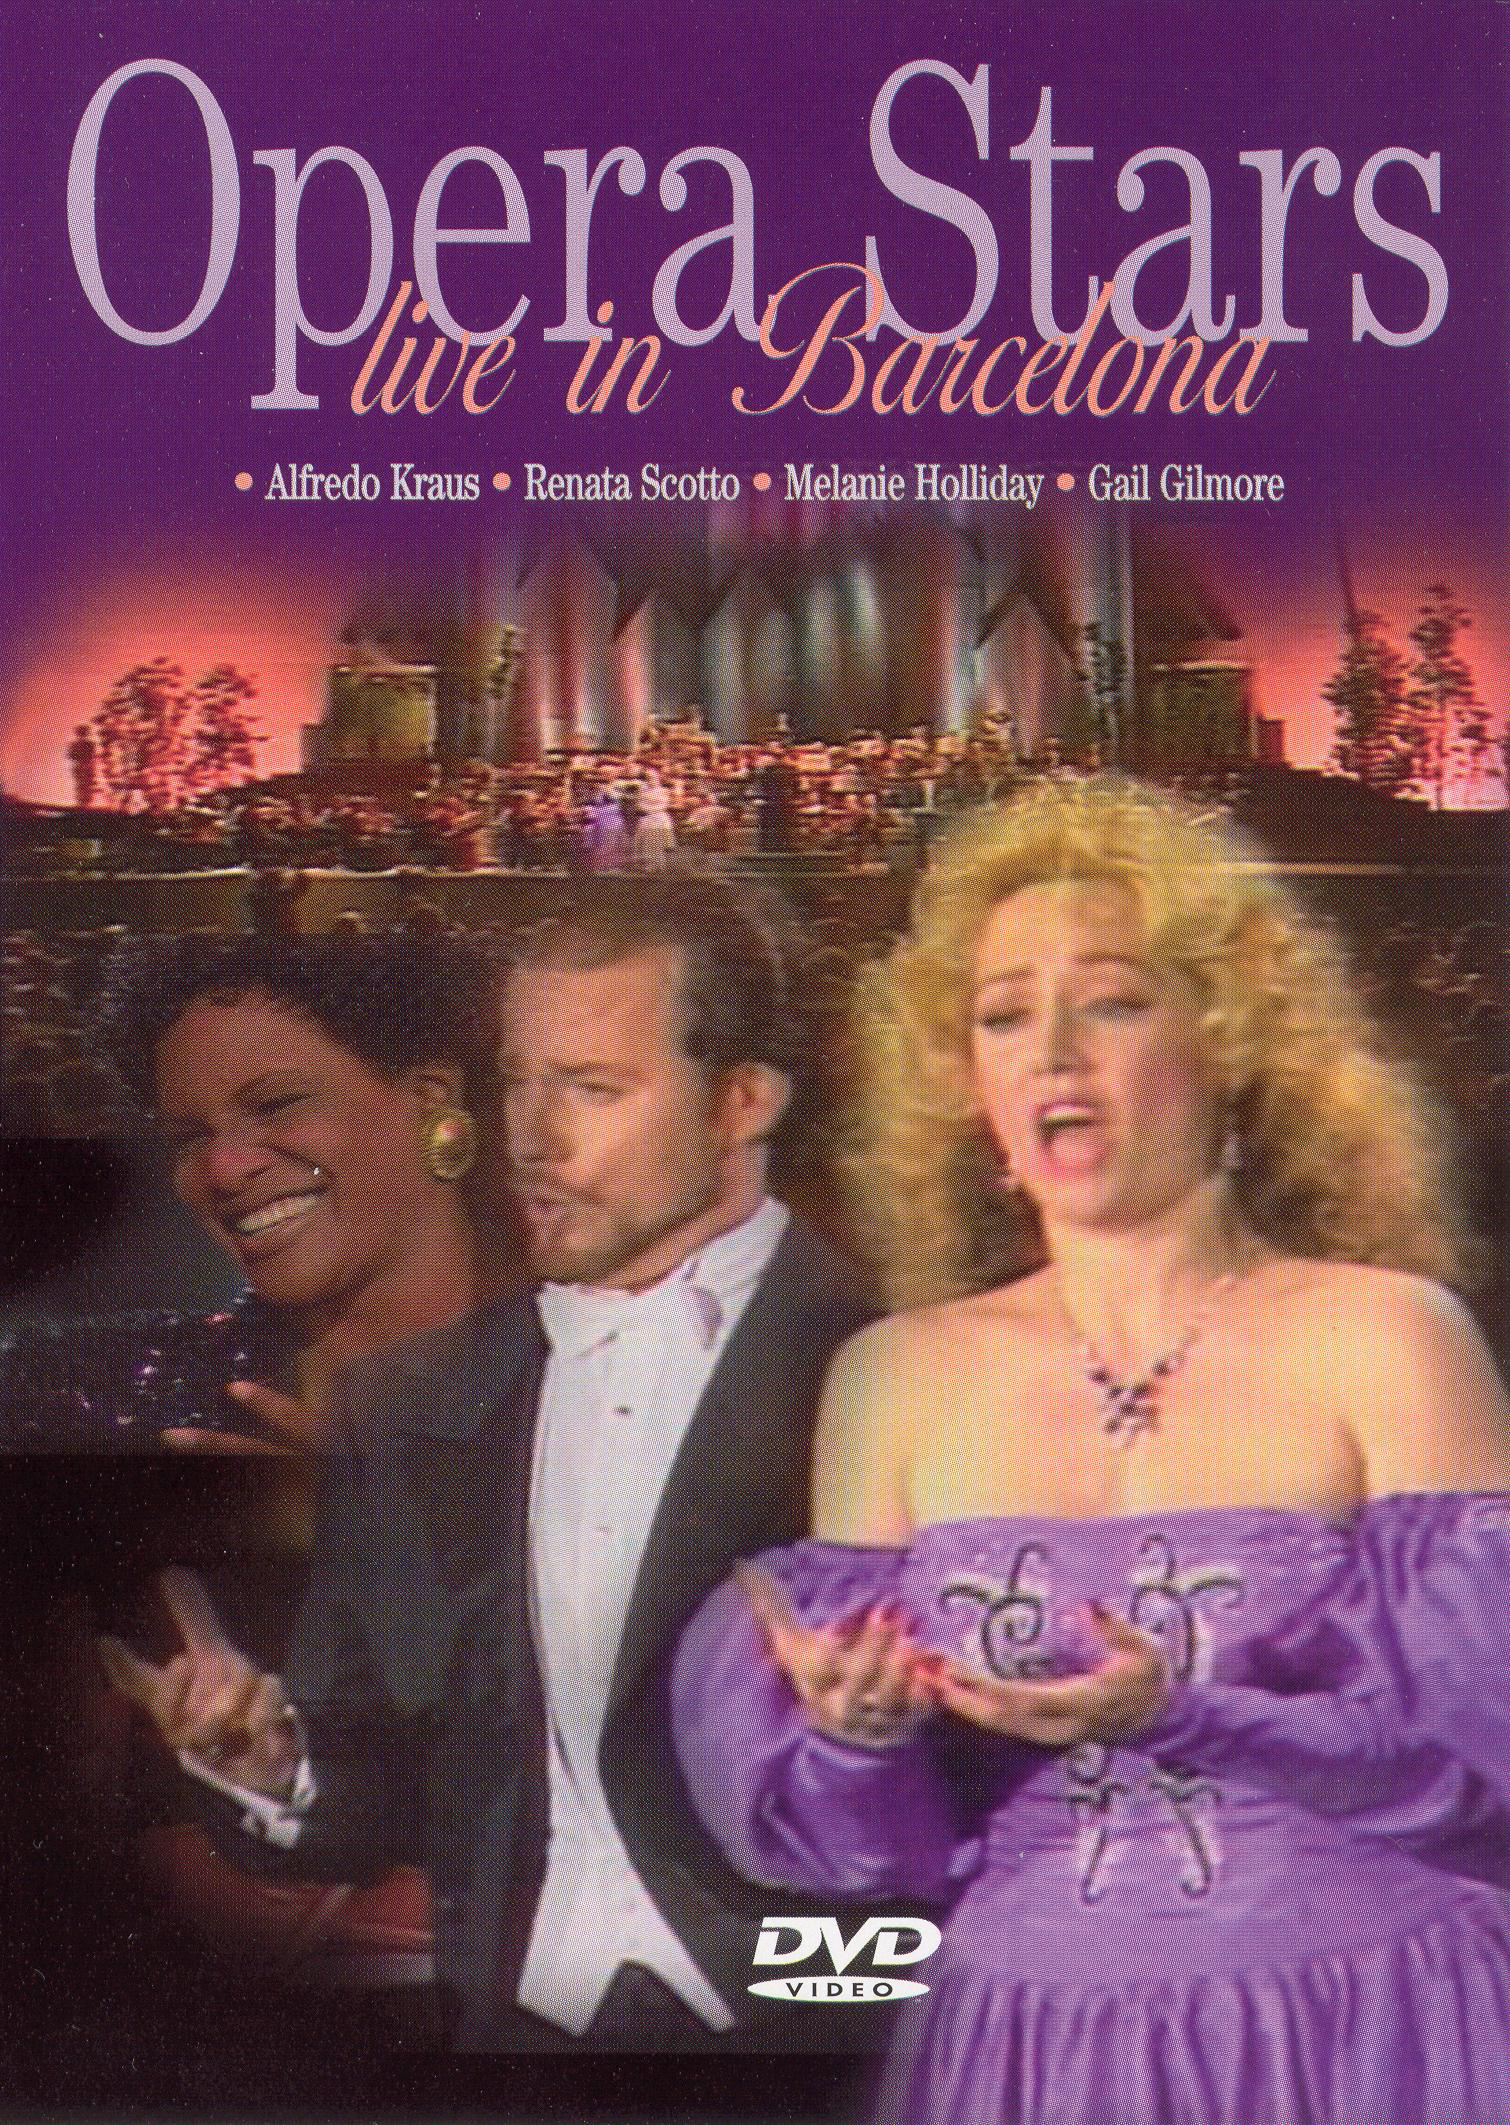 Opera Stars Live in Barcelona